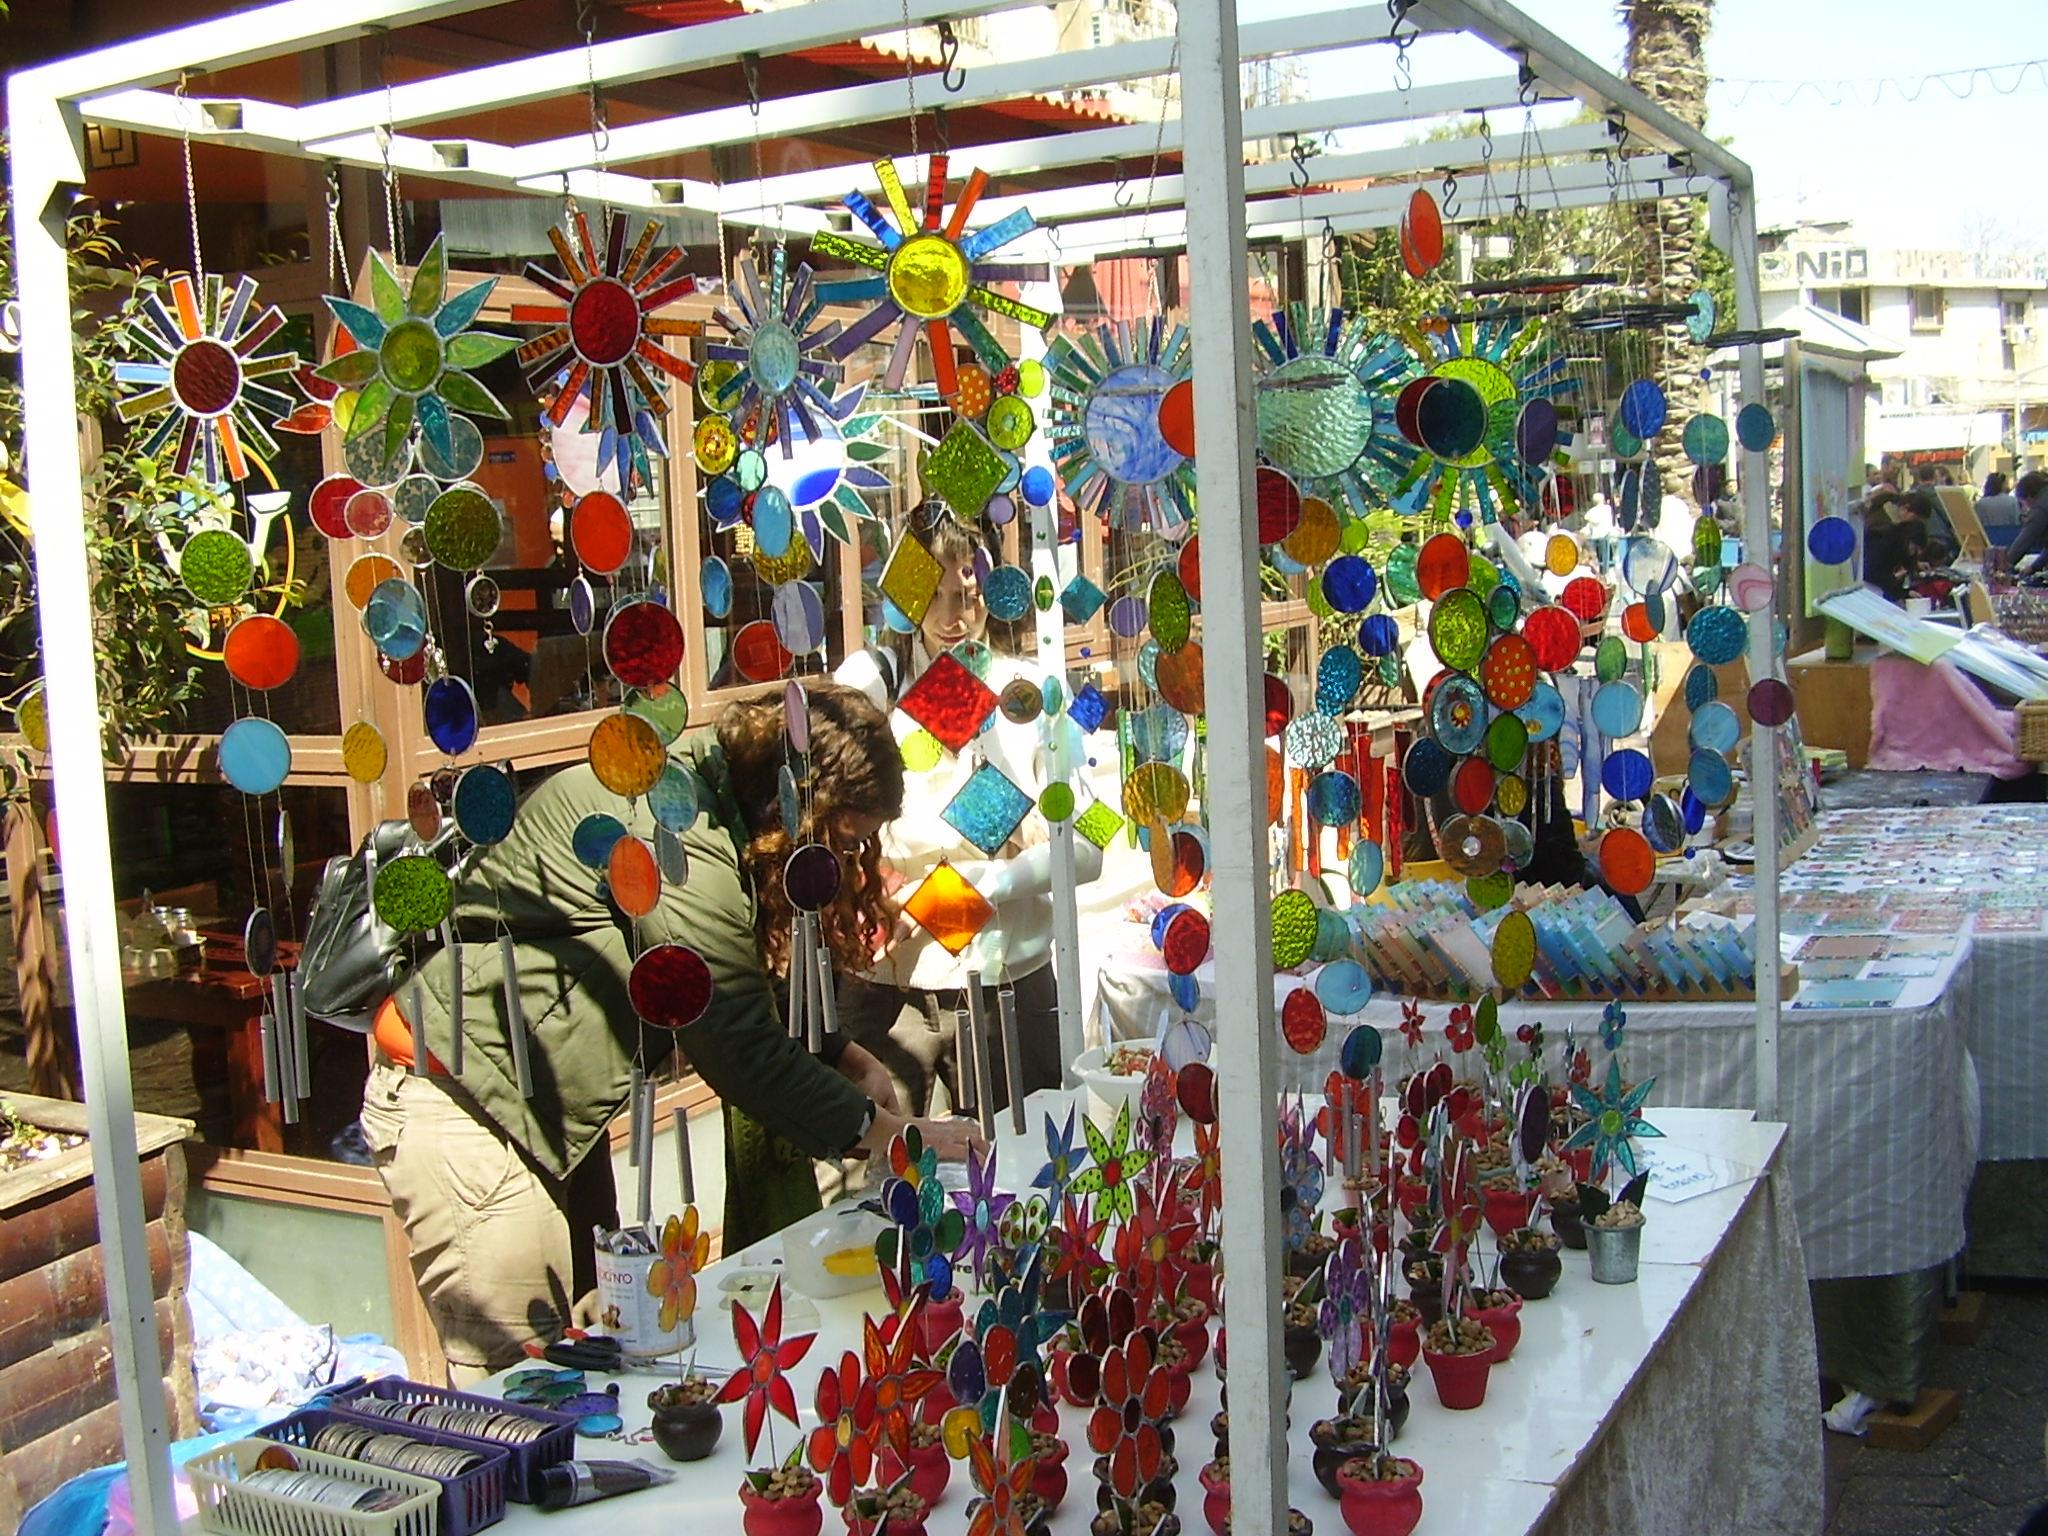 Streets of tel aviv a walker 39 s paradise unlock tel aviv for Arts and crafts fairs